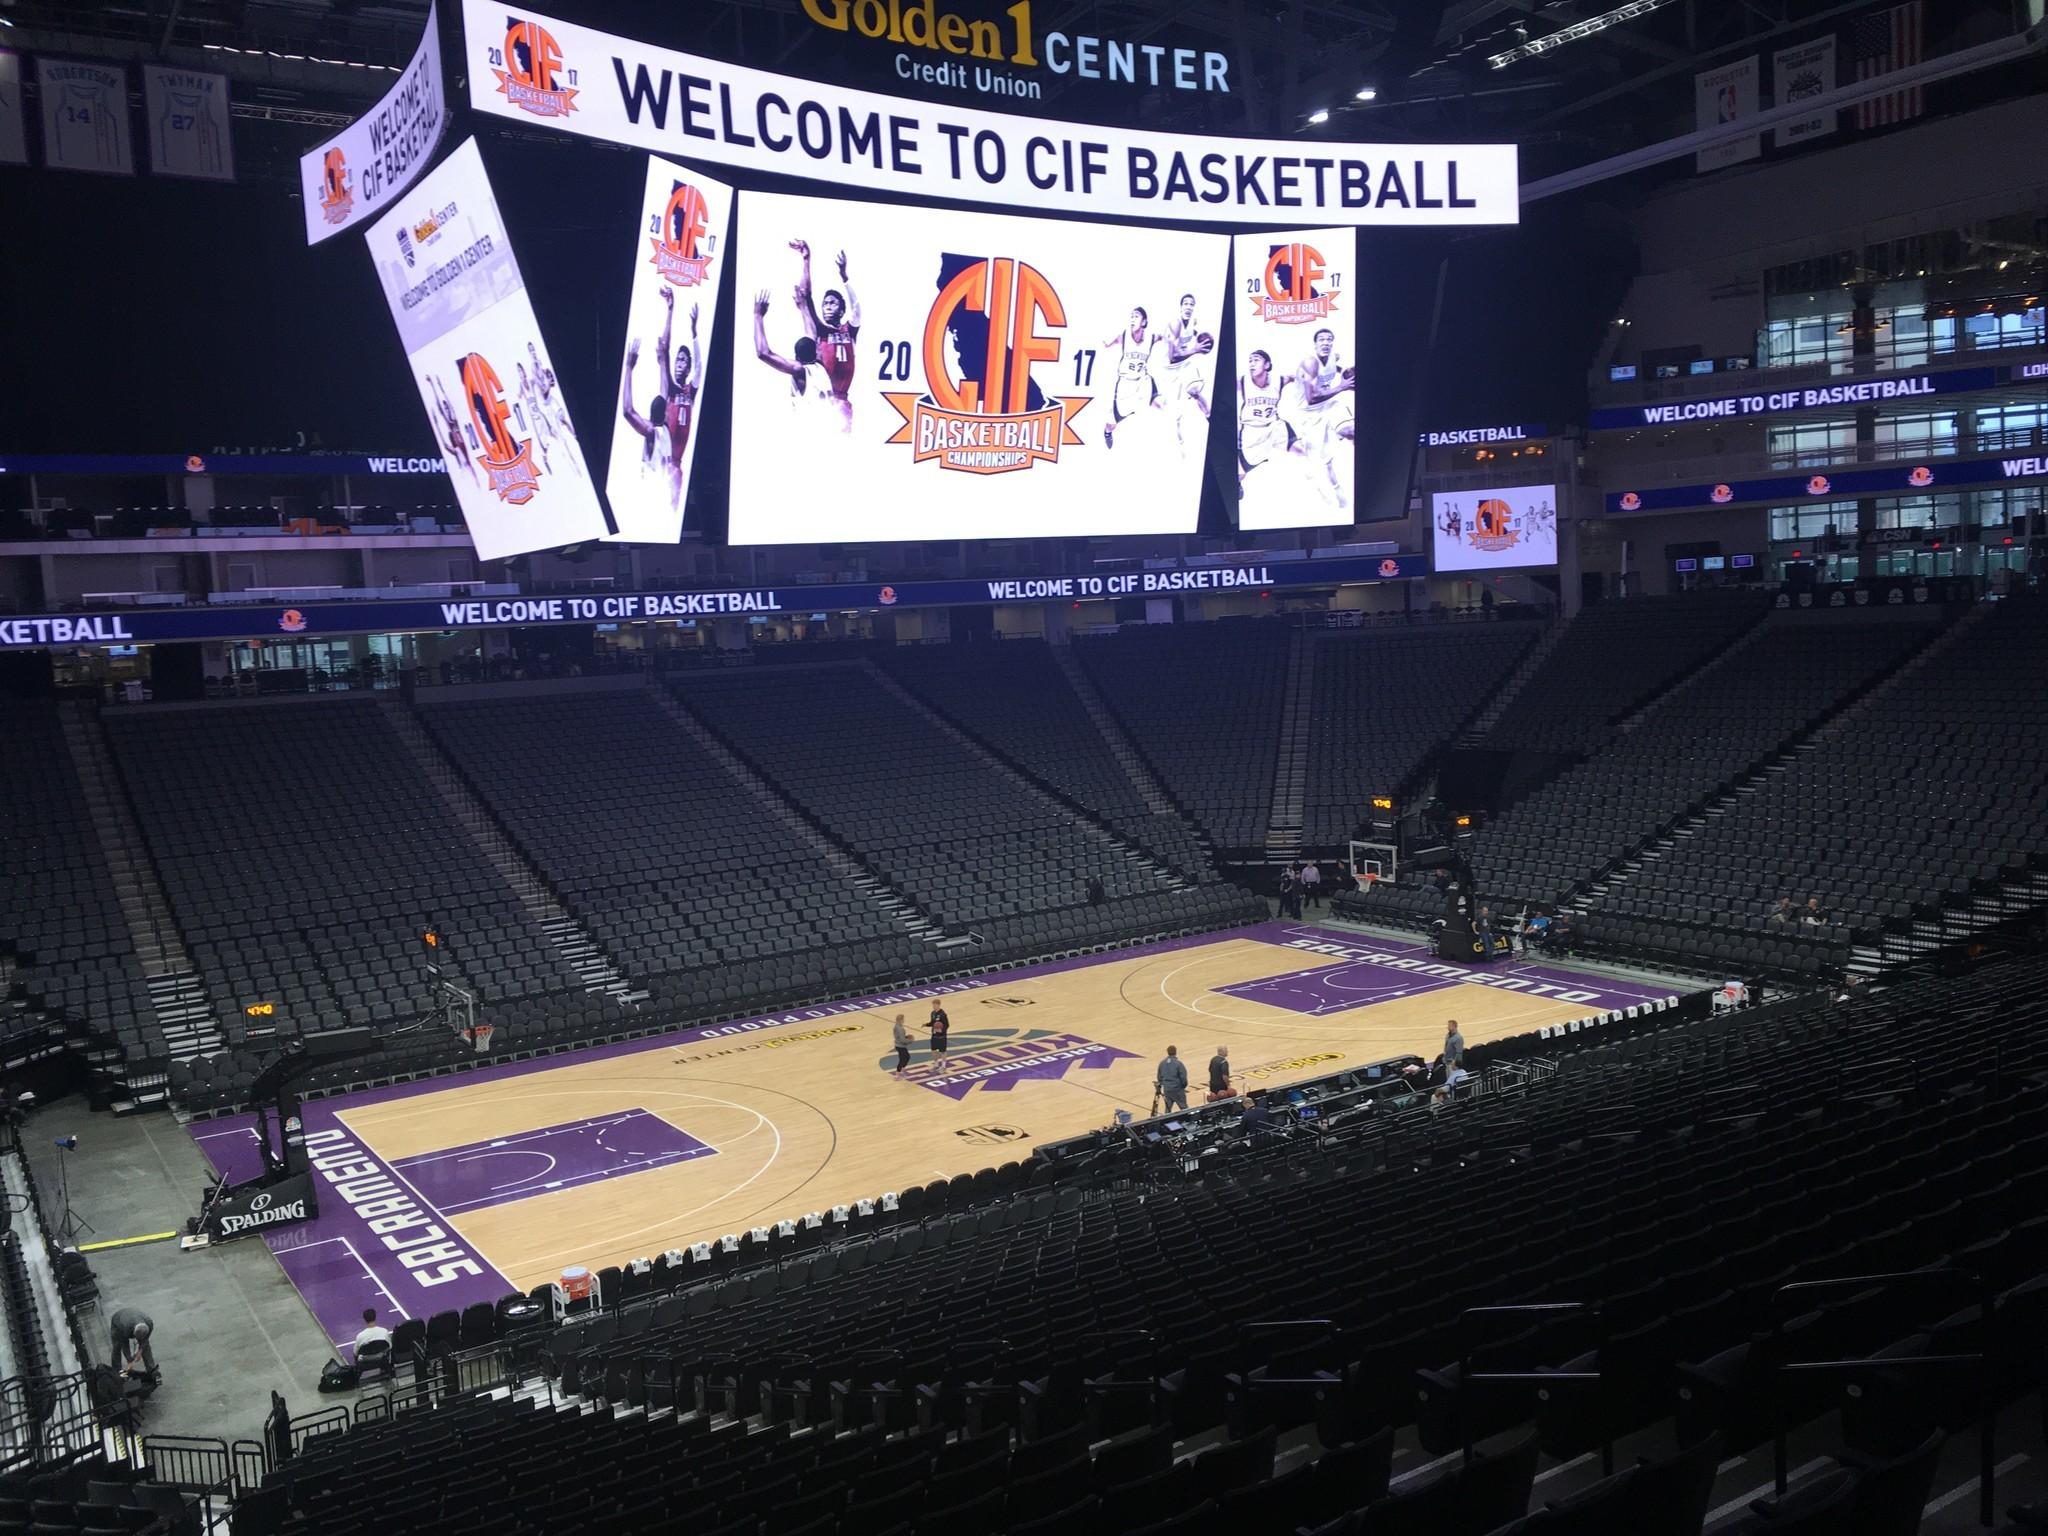 Inside the Golden 1 Center in Sacramento